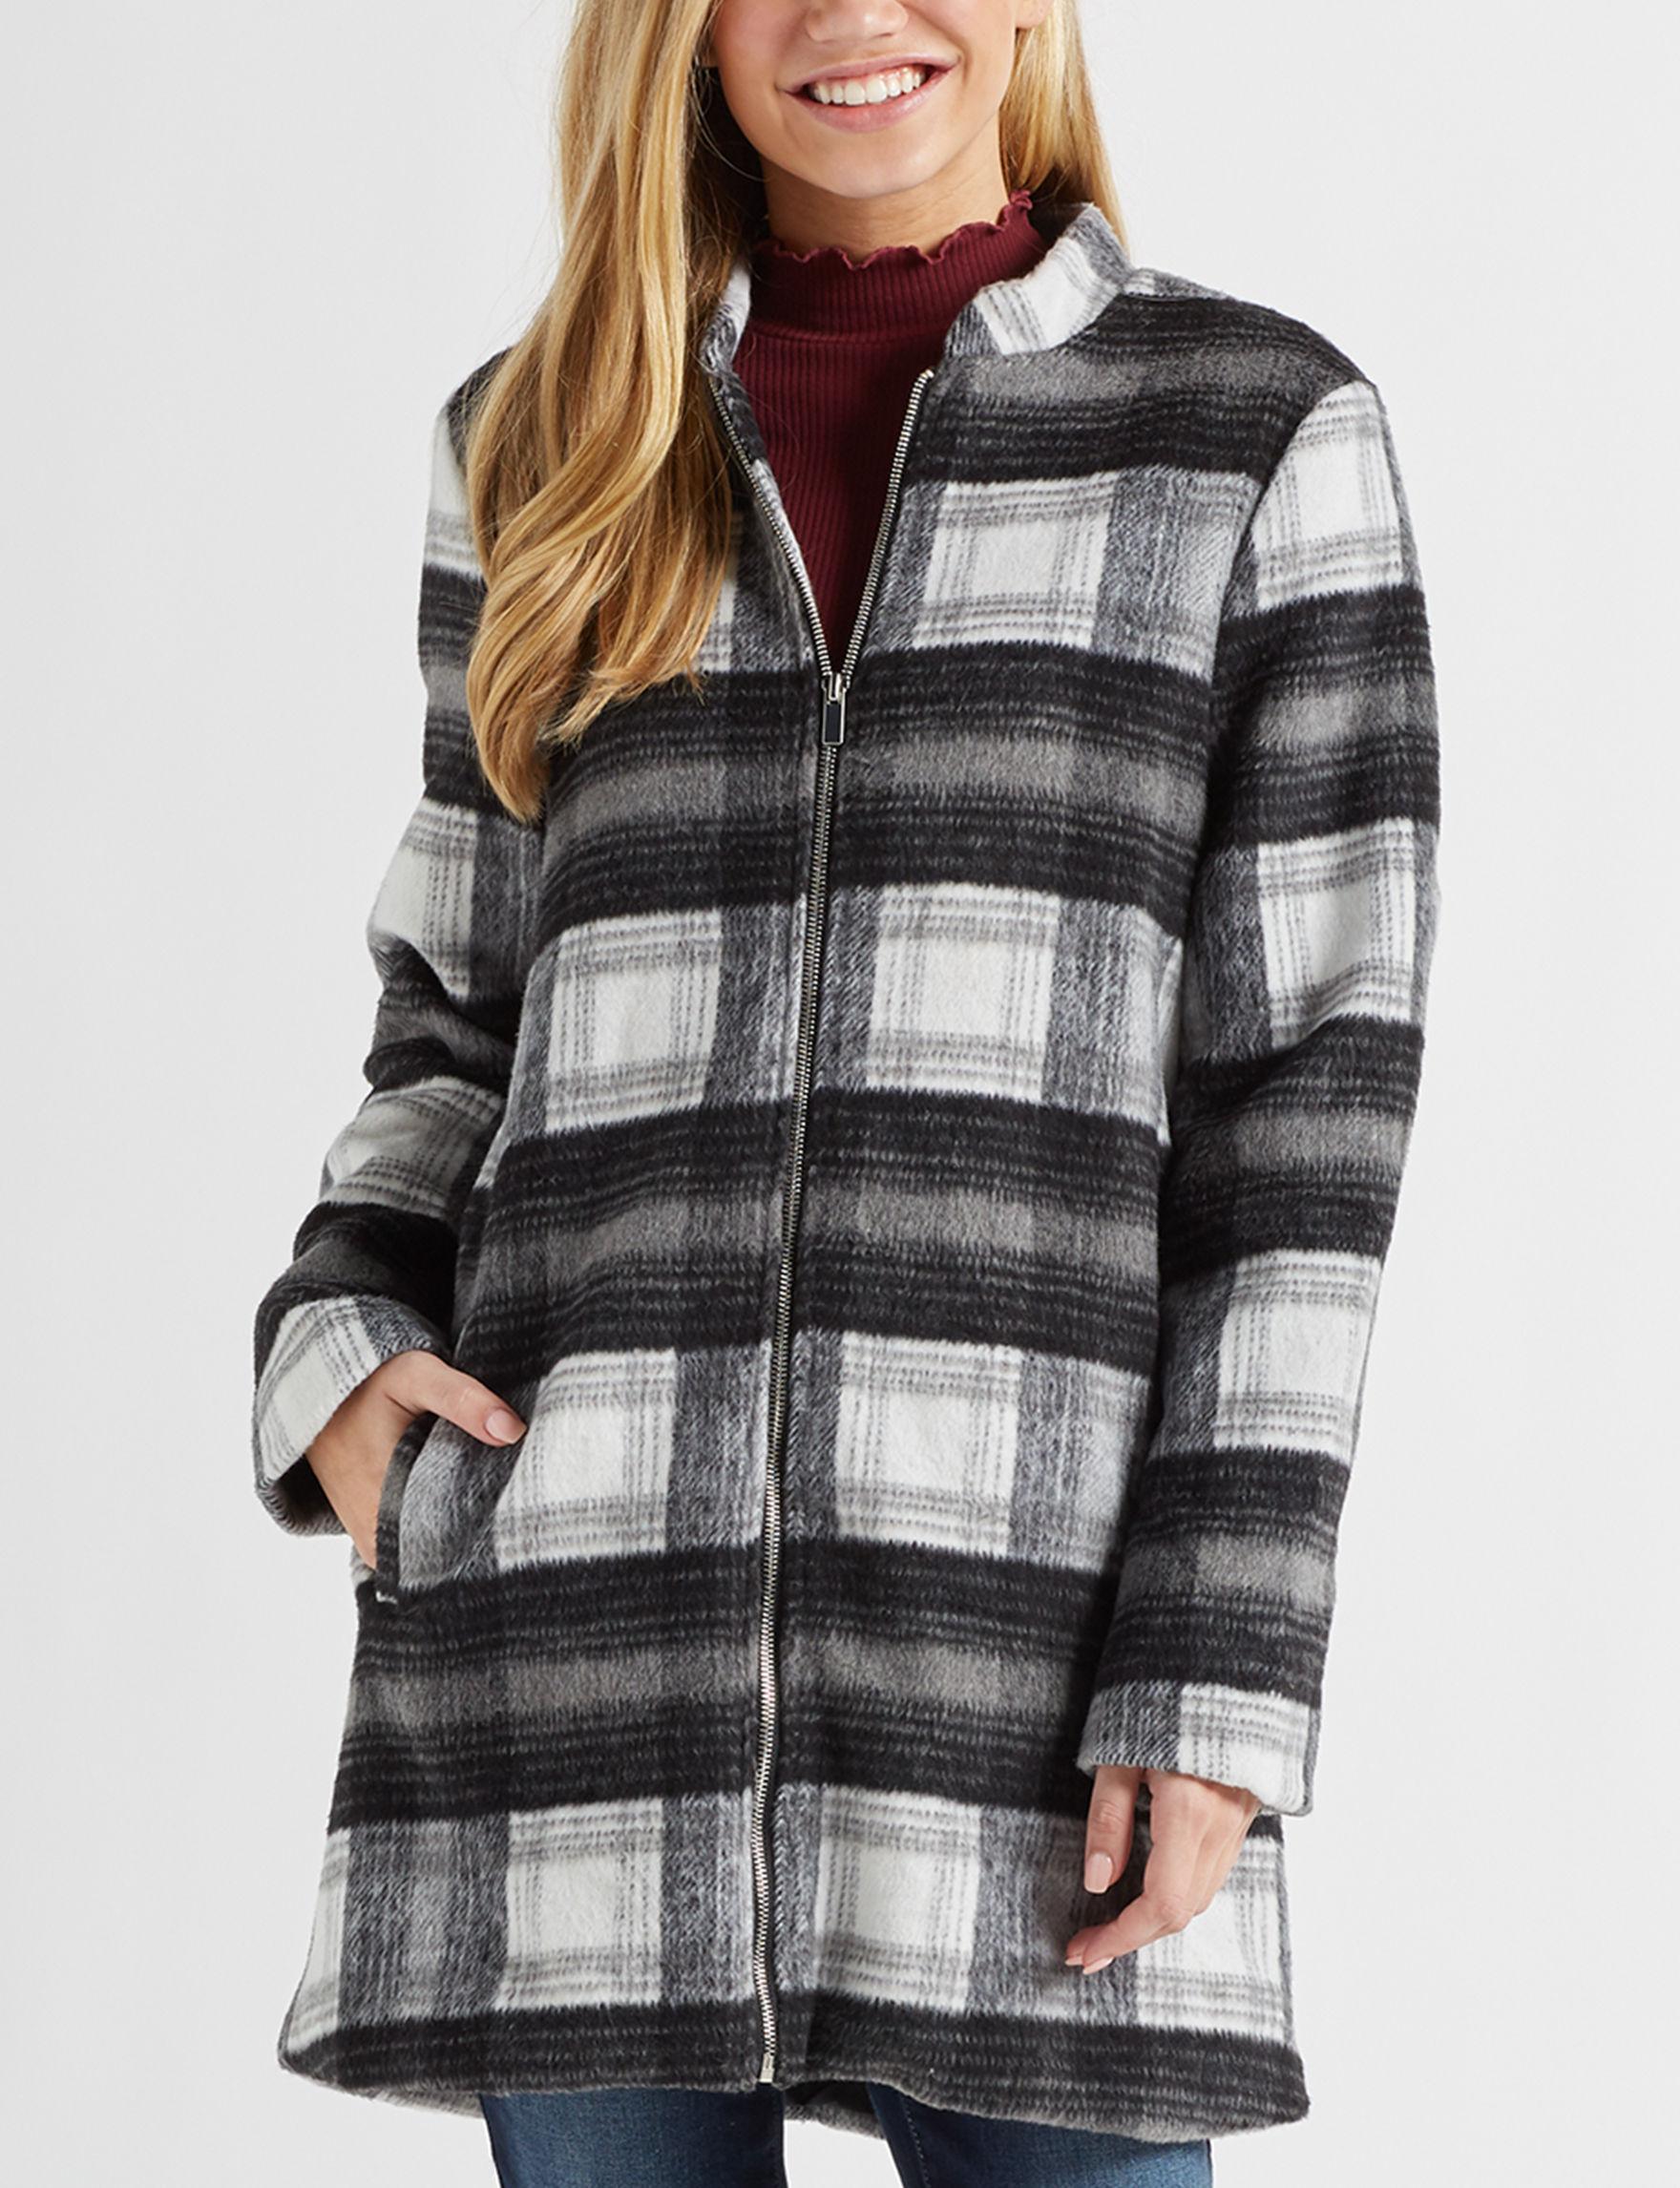 Stoosh Black / White / Grey Peacoats & Overcoats